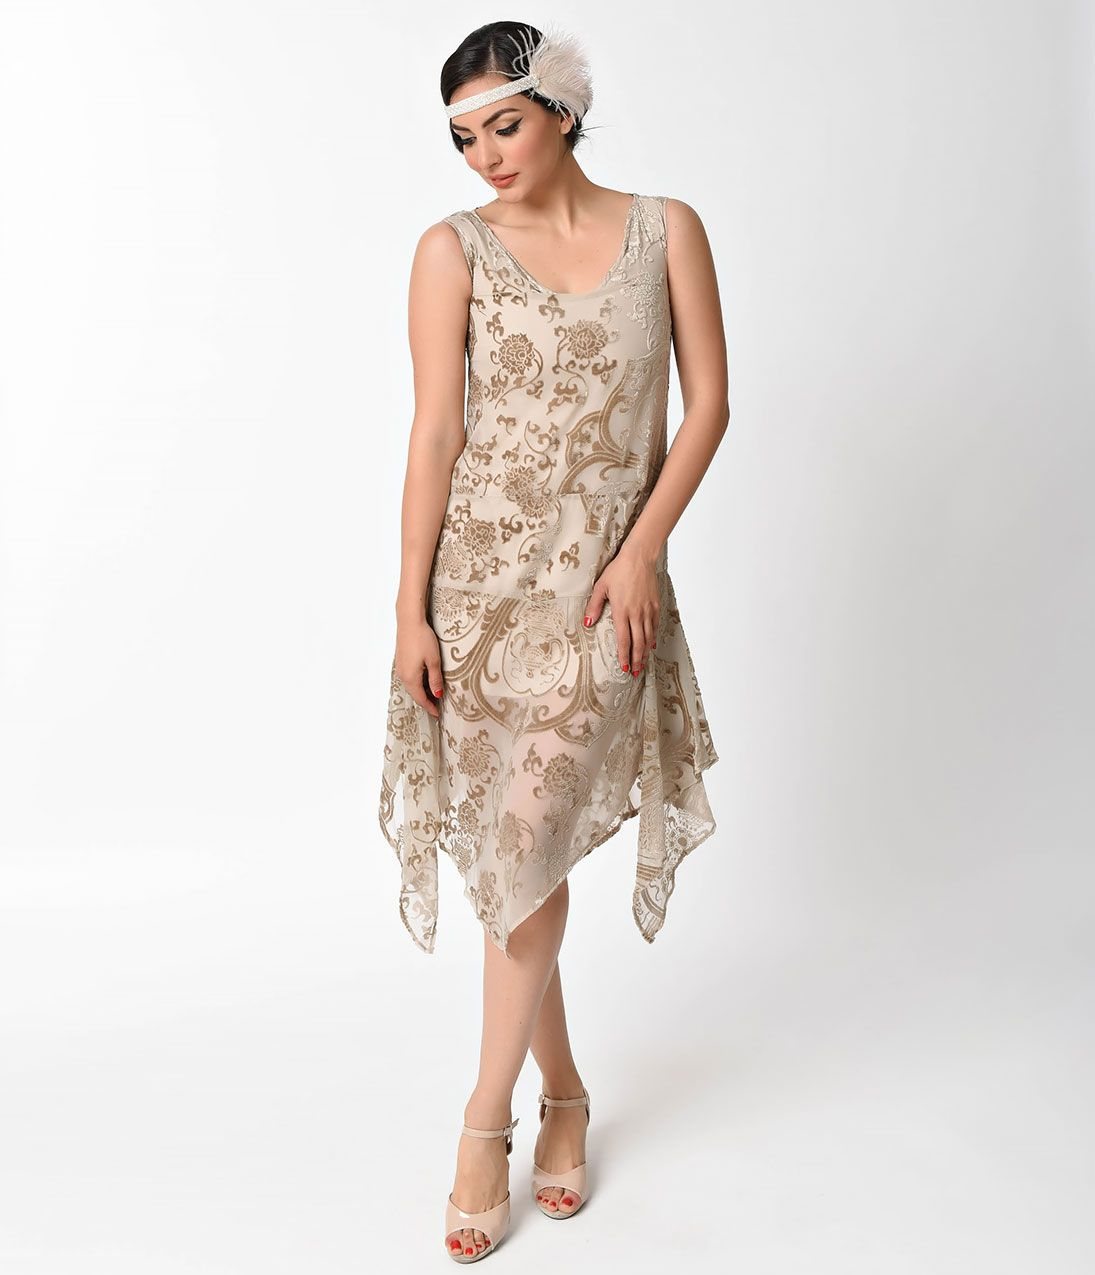 1920\'s Style Dresses: Flapper Dresses to Gatsby dresses   Pinterest